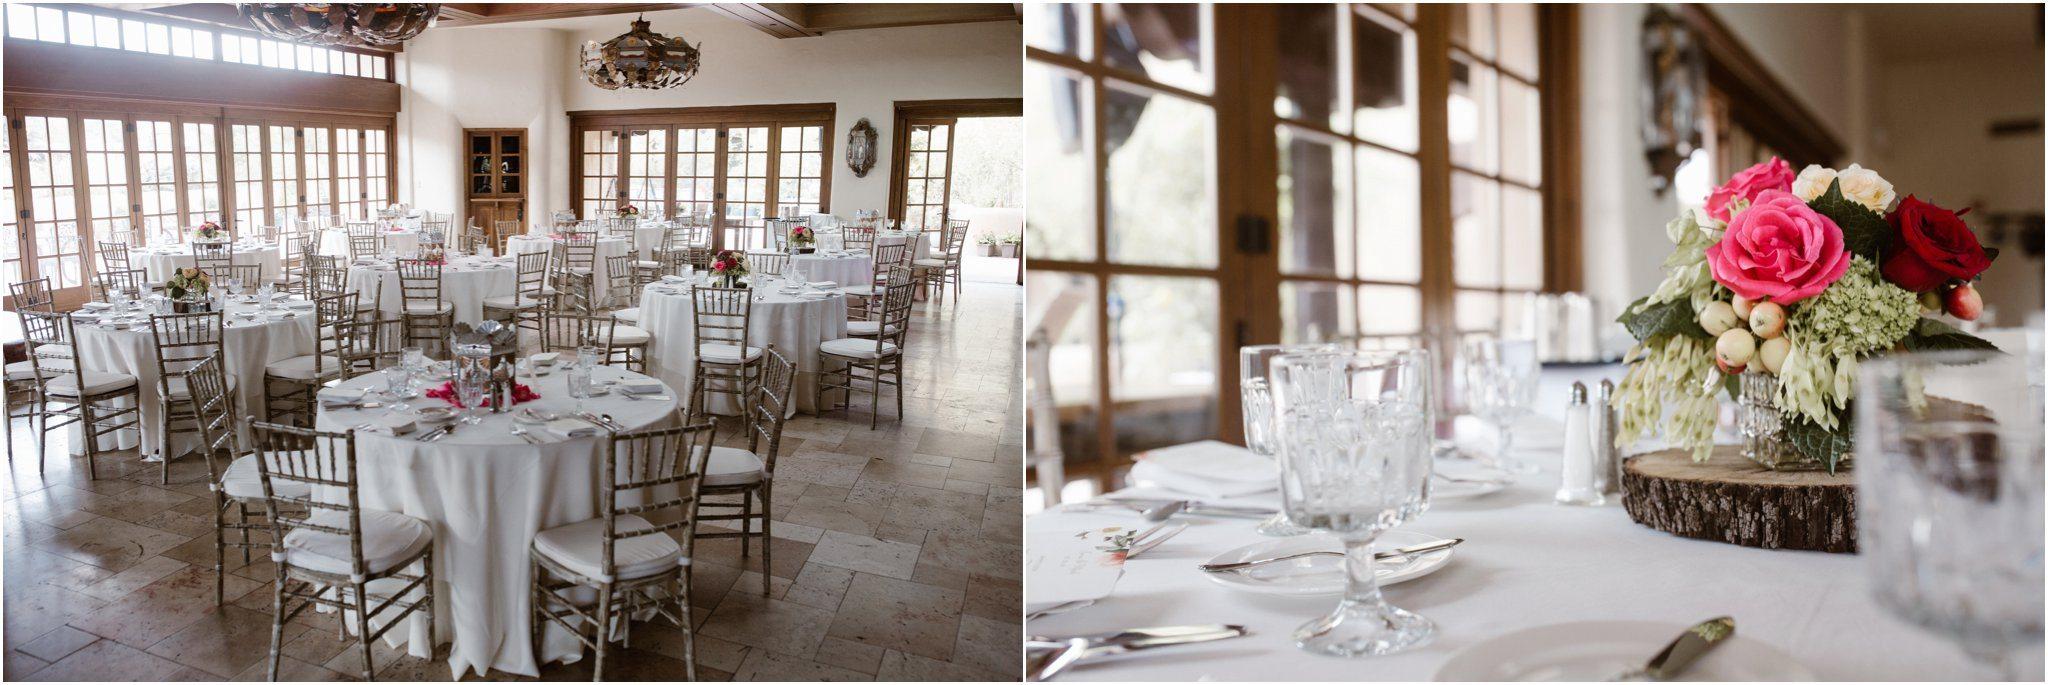 0067albuquerque-wedding-photographer_-santa-fe-wedding-photographer_-southwest-wedding-photography_-blue-rose-studio